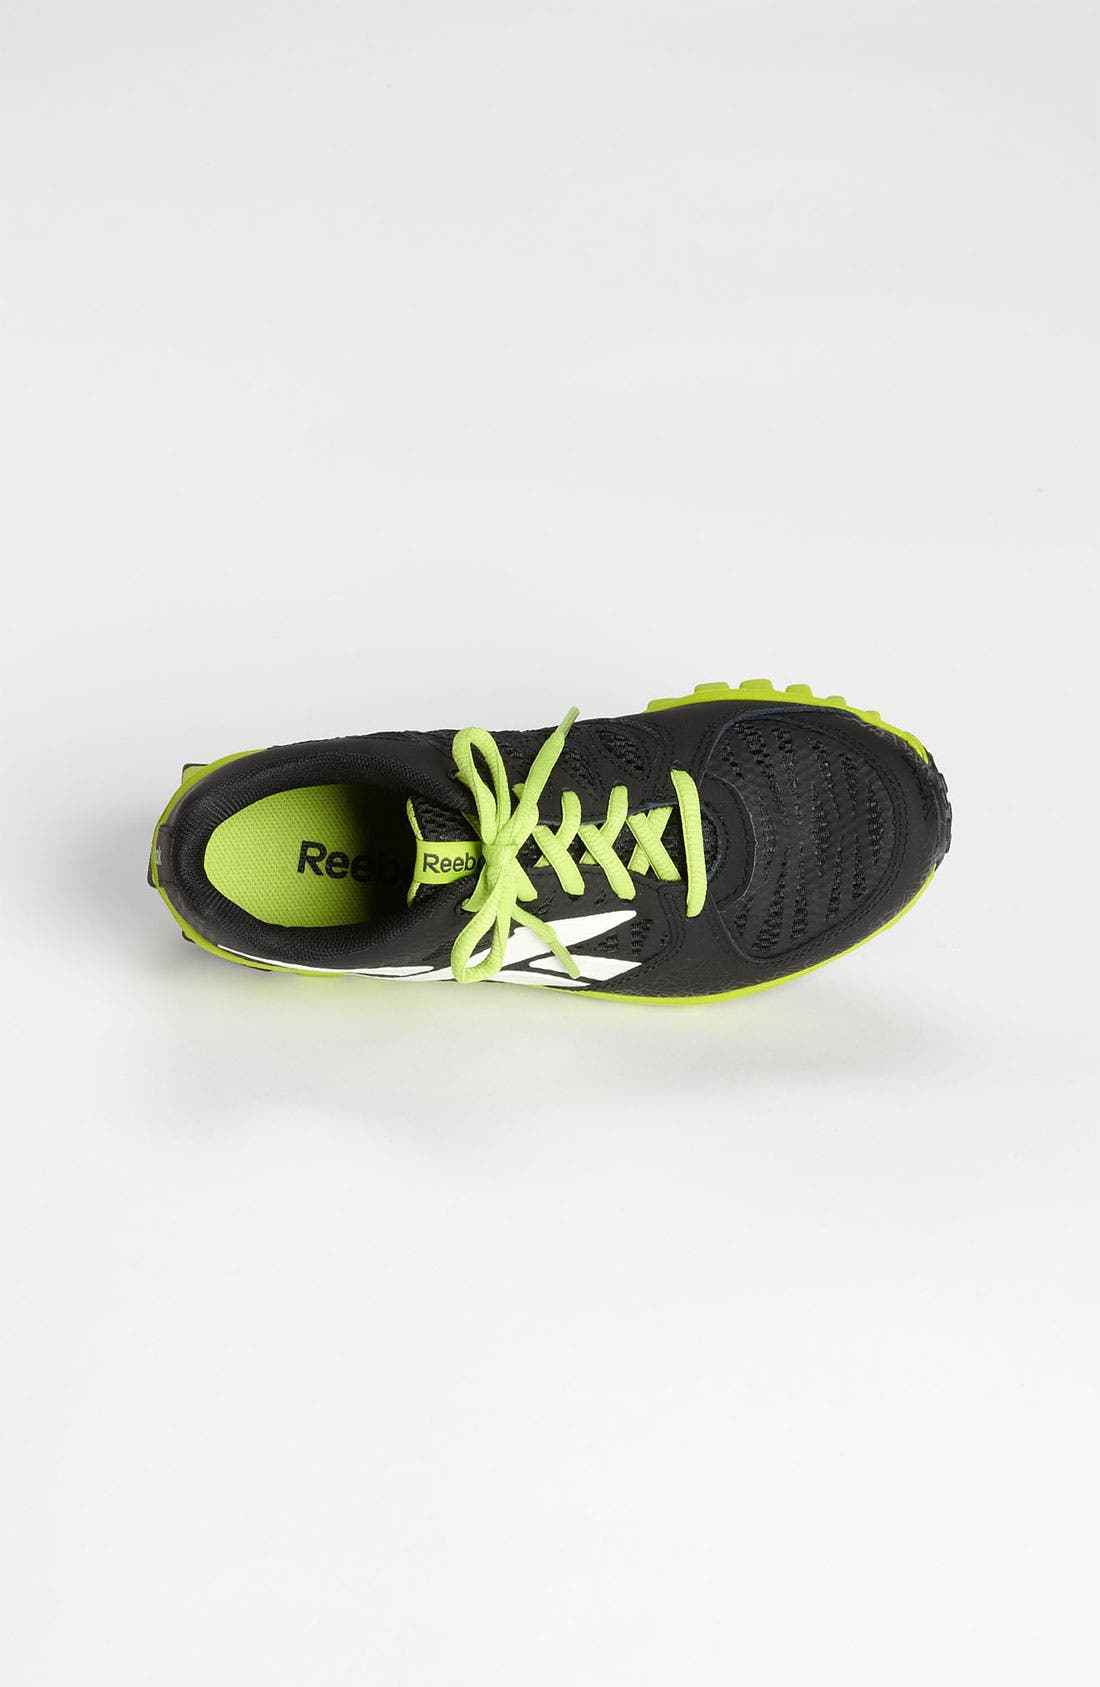 Alternate Image 3  - Reebok 'RealFlex Transition 2.0' Sneaker (Toddler, Little Kid & Big Kid)